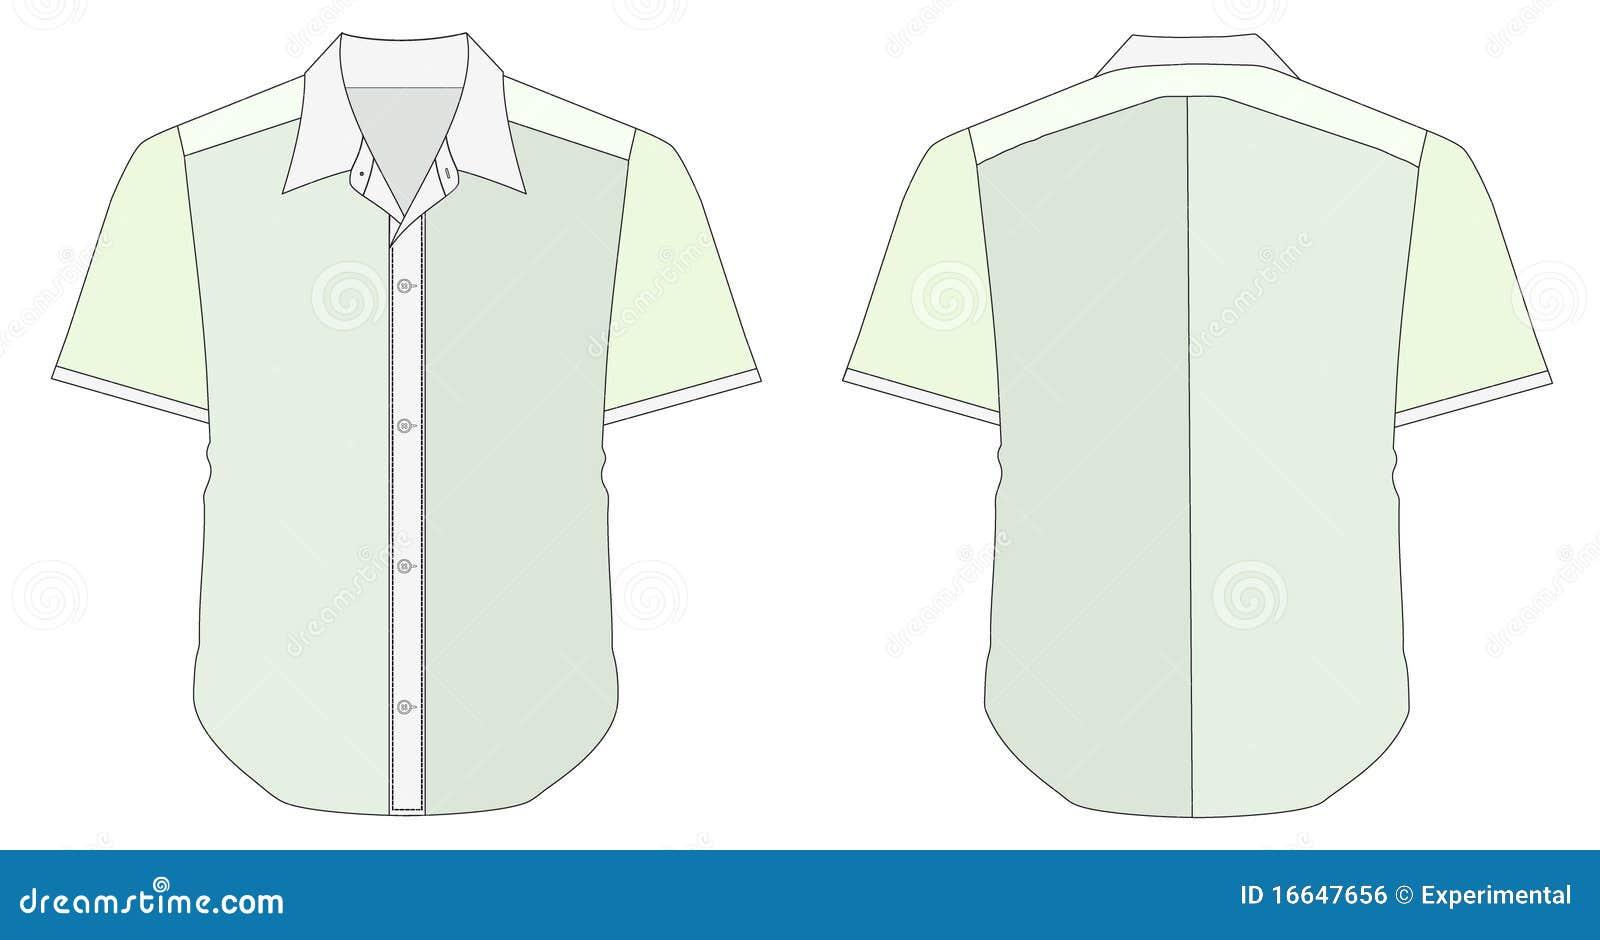 collar dress shirt in blue green color tones royalty free. Black Bedroom Furniture Sets. Home Design Ideas